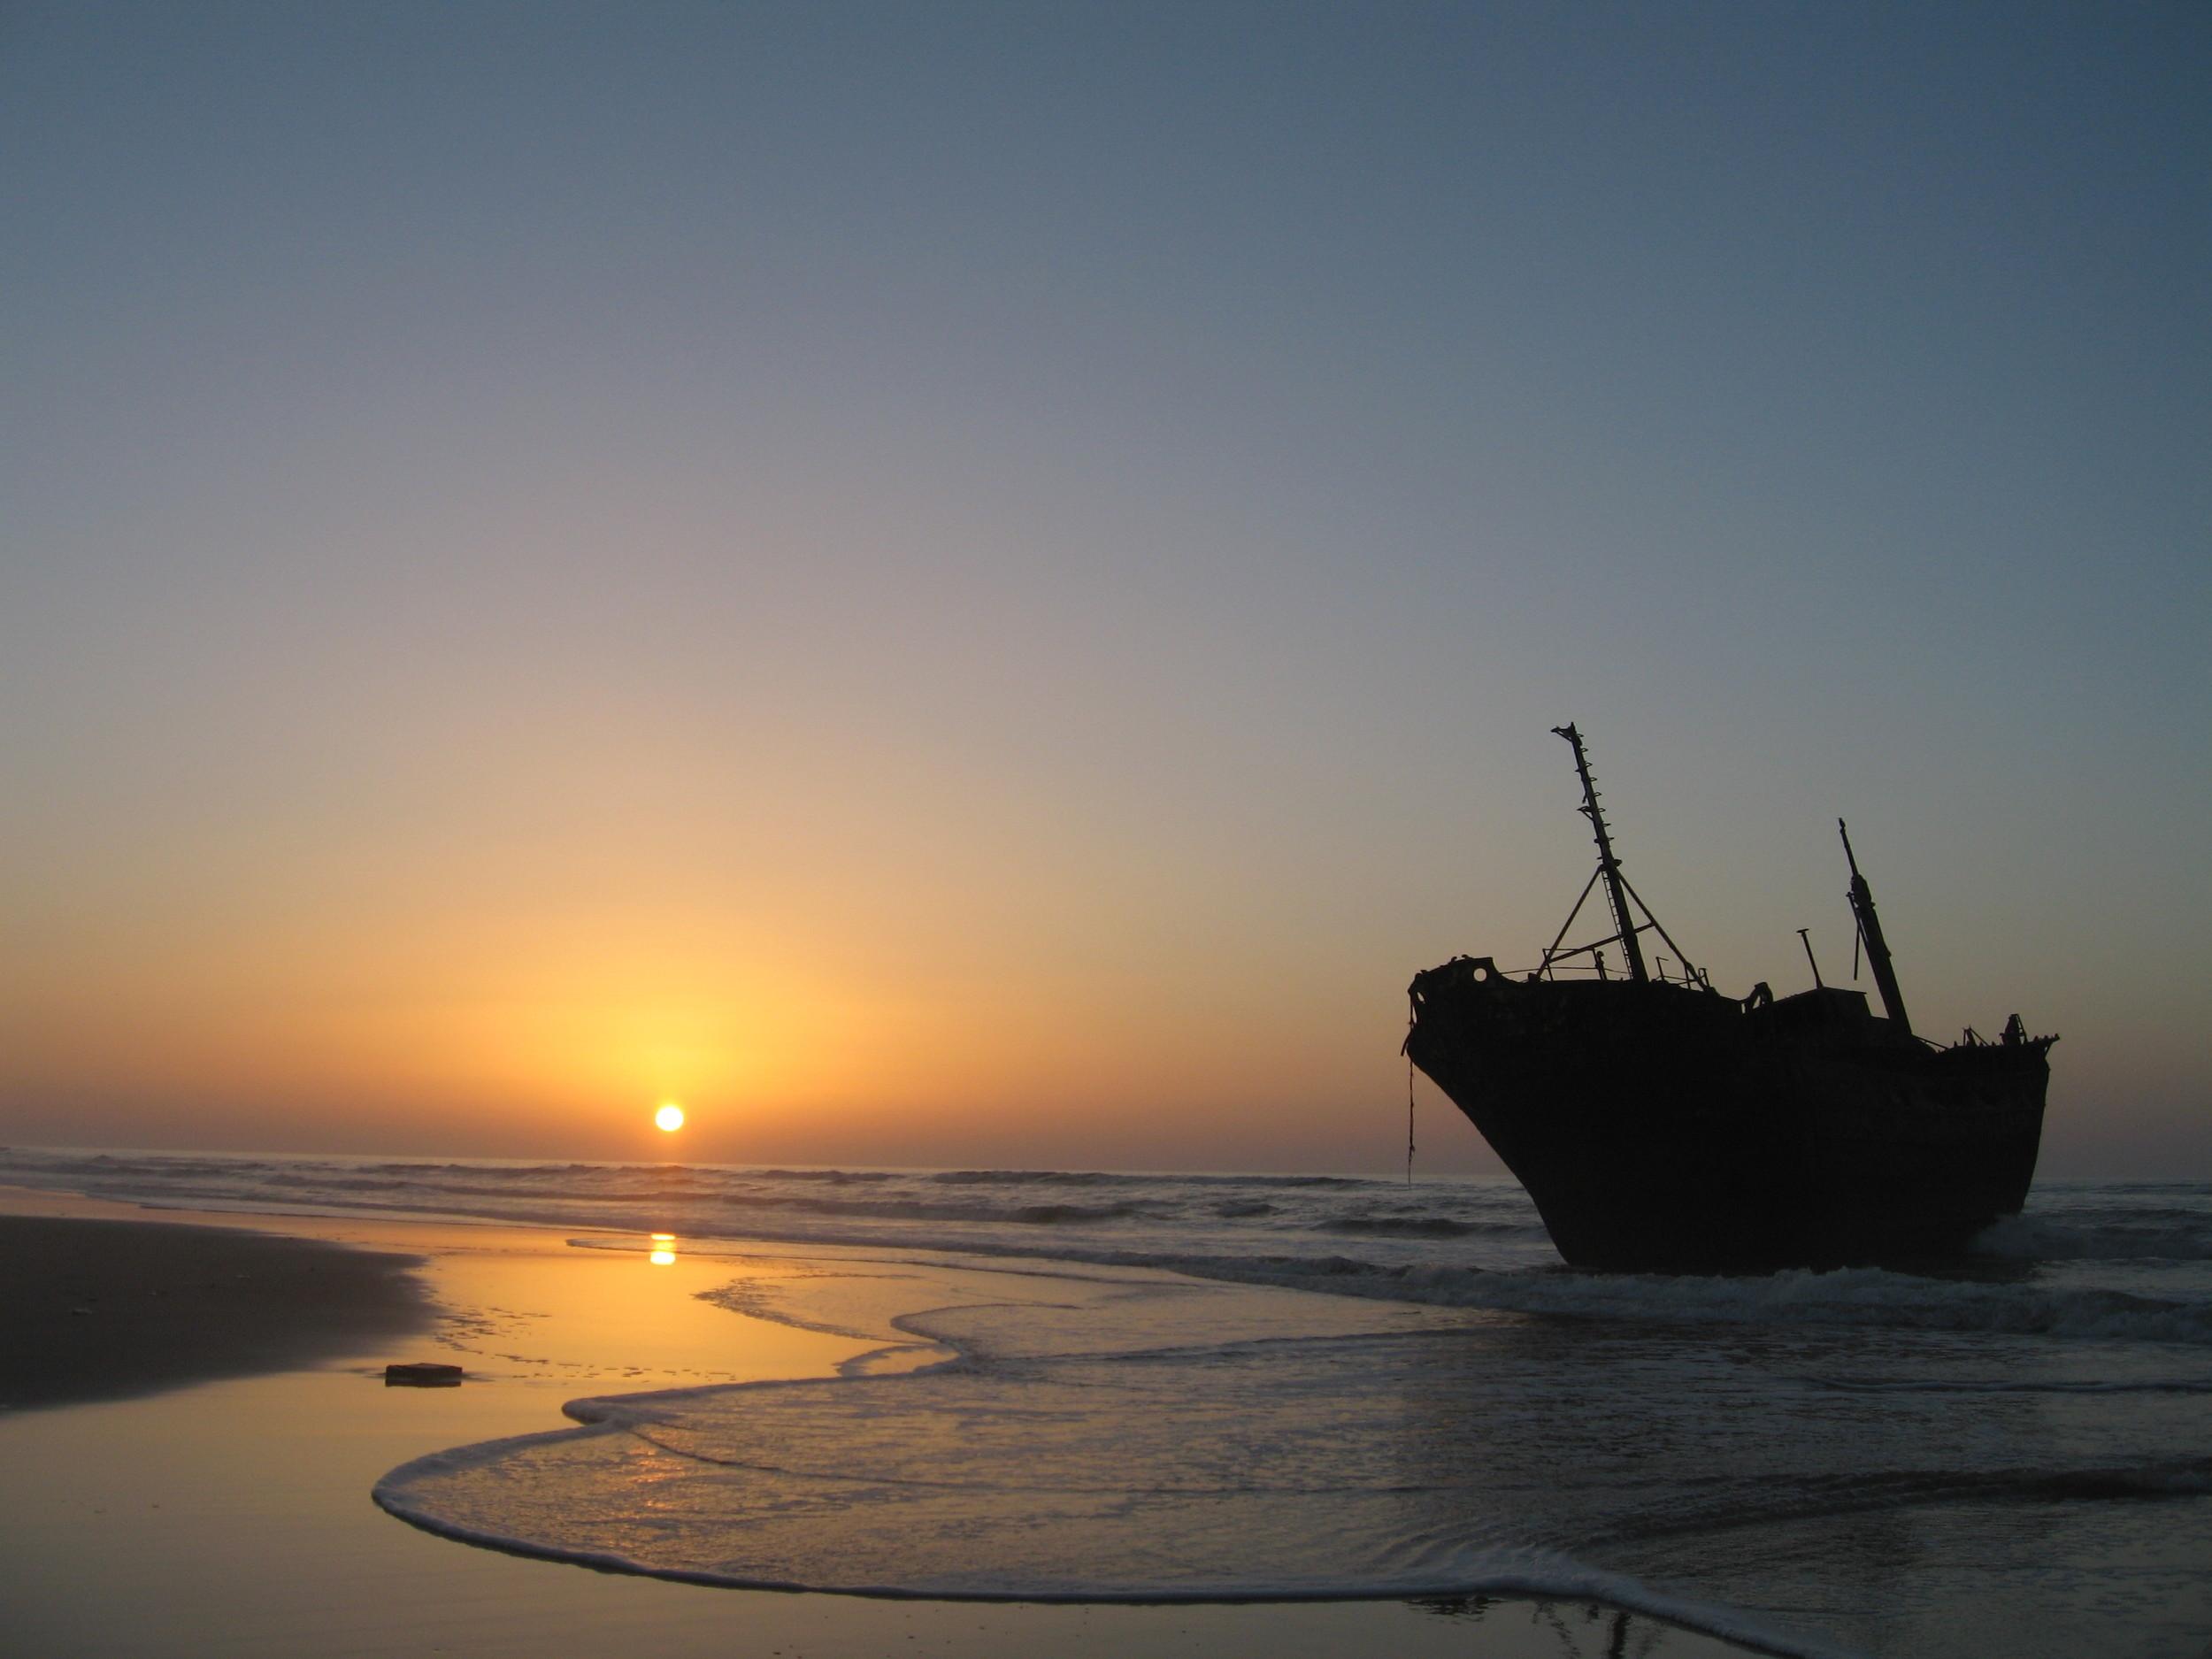 Shipwreck along the coast of western sahara.  CREDIT: IMAGE BY Jurgen, https://www.flickr.com/photos/300tdorg/3518340136.